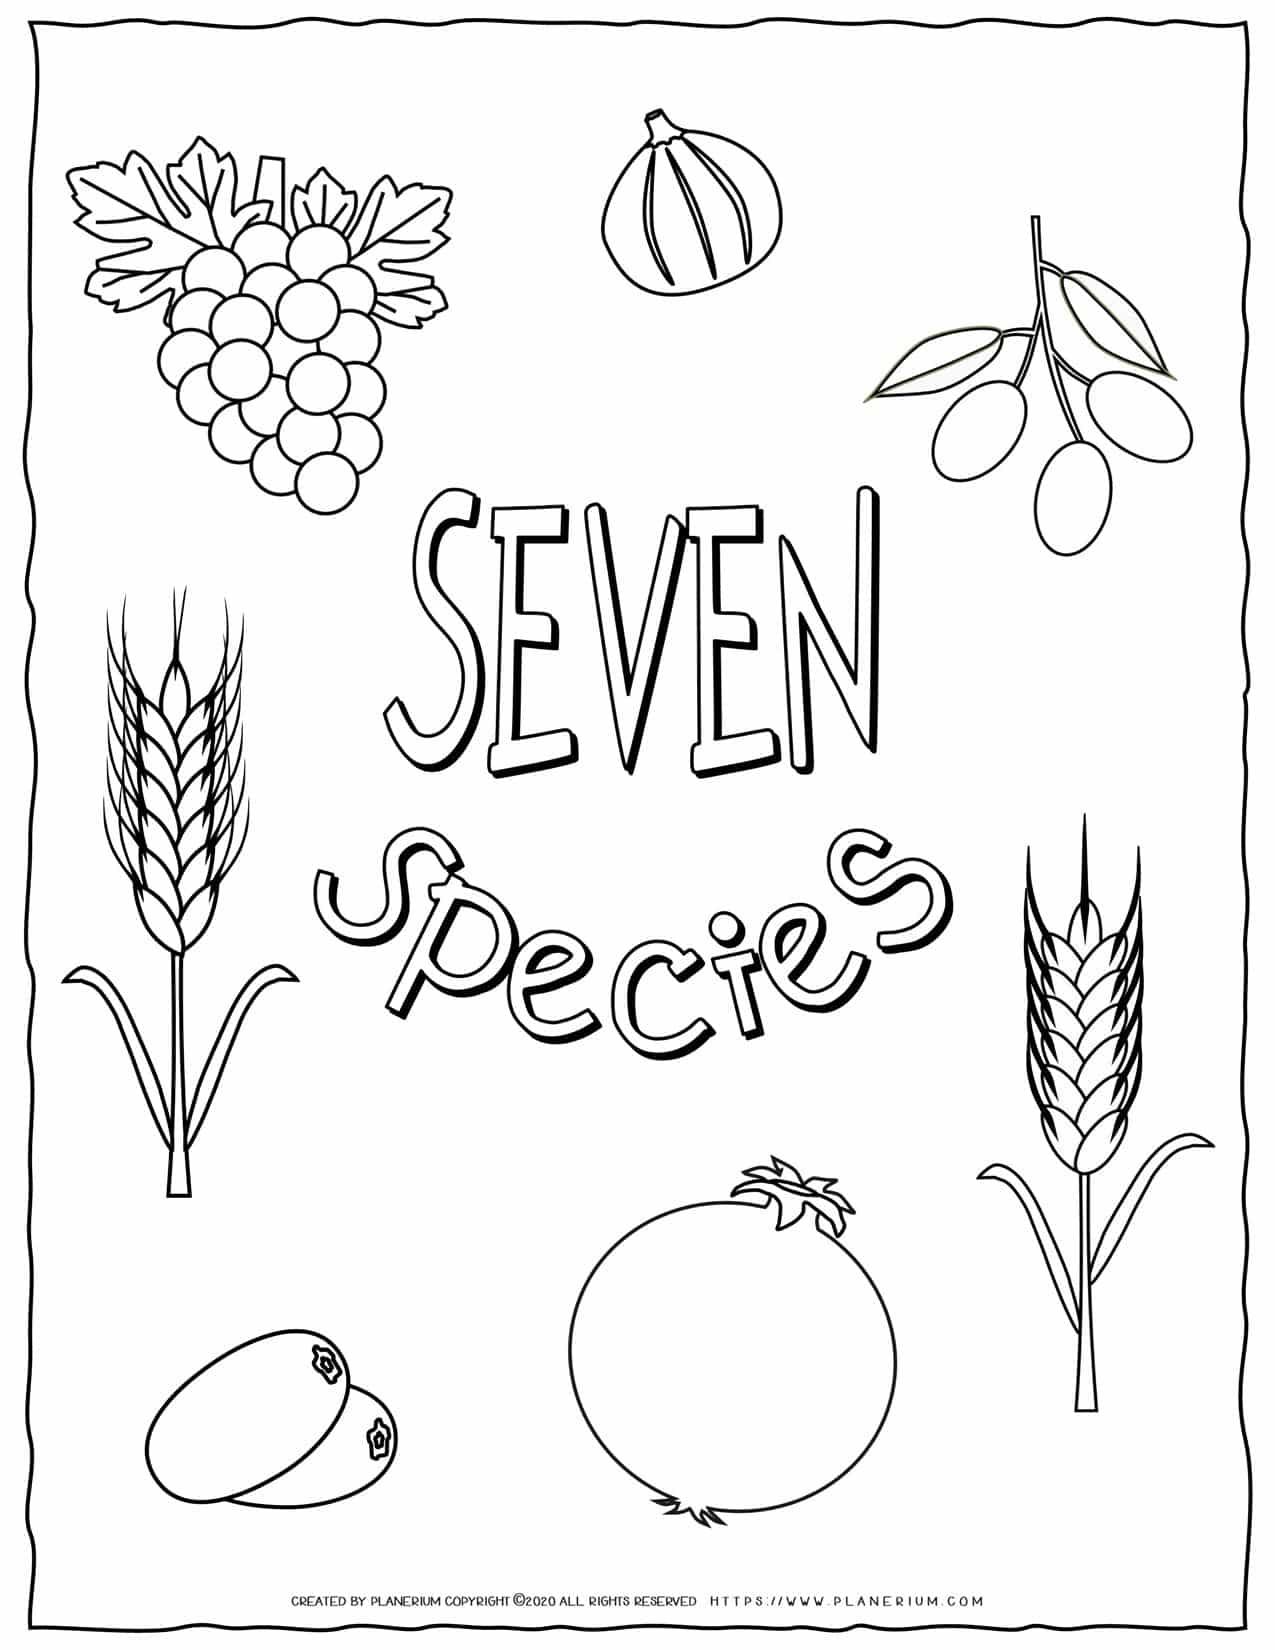 Shavuot Coloring Page - The Seven Species | Planerium